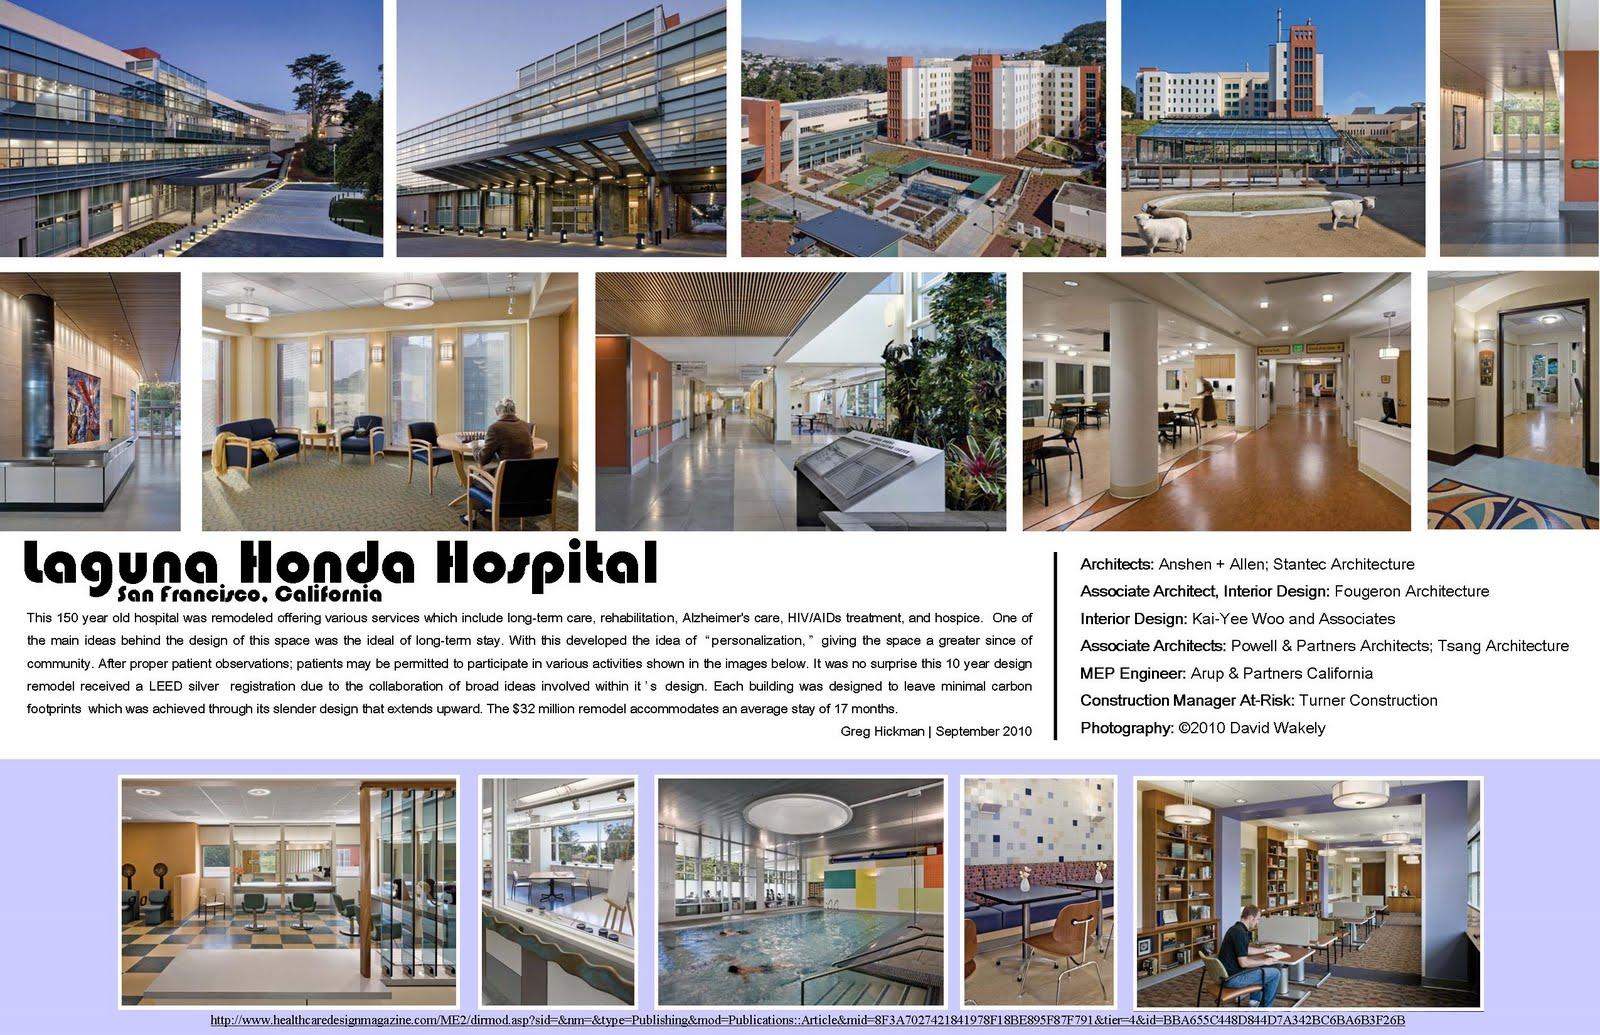 Greg Hickman Designs: Precedent ysis | Laguna Honda Hospital